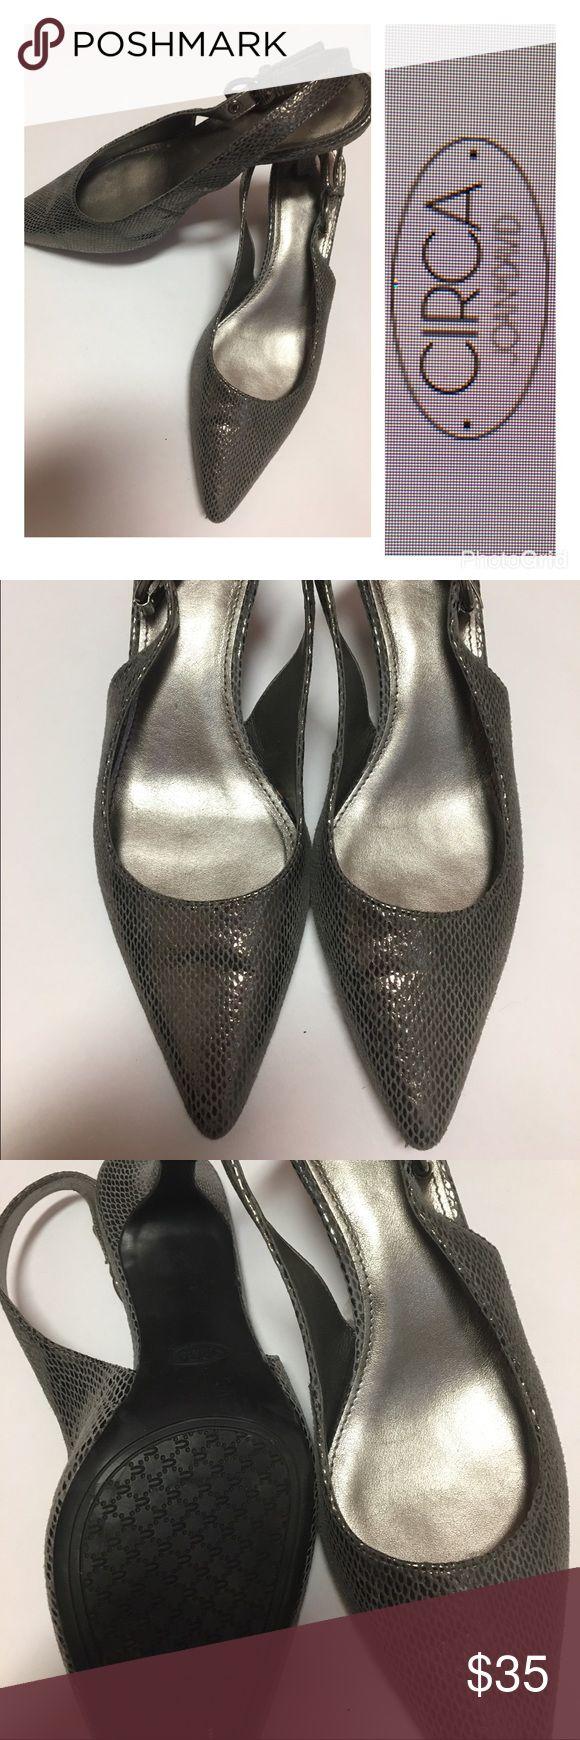 👠👠Joan&David Leather Shoes 61/2👠👠 Beautiful leather silver slingbacks by Joan &David like new condition Joan & David Shoes Heels